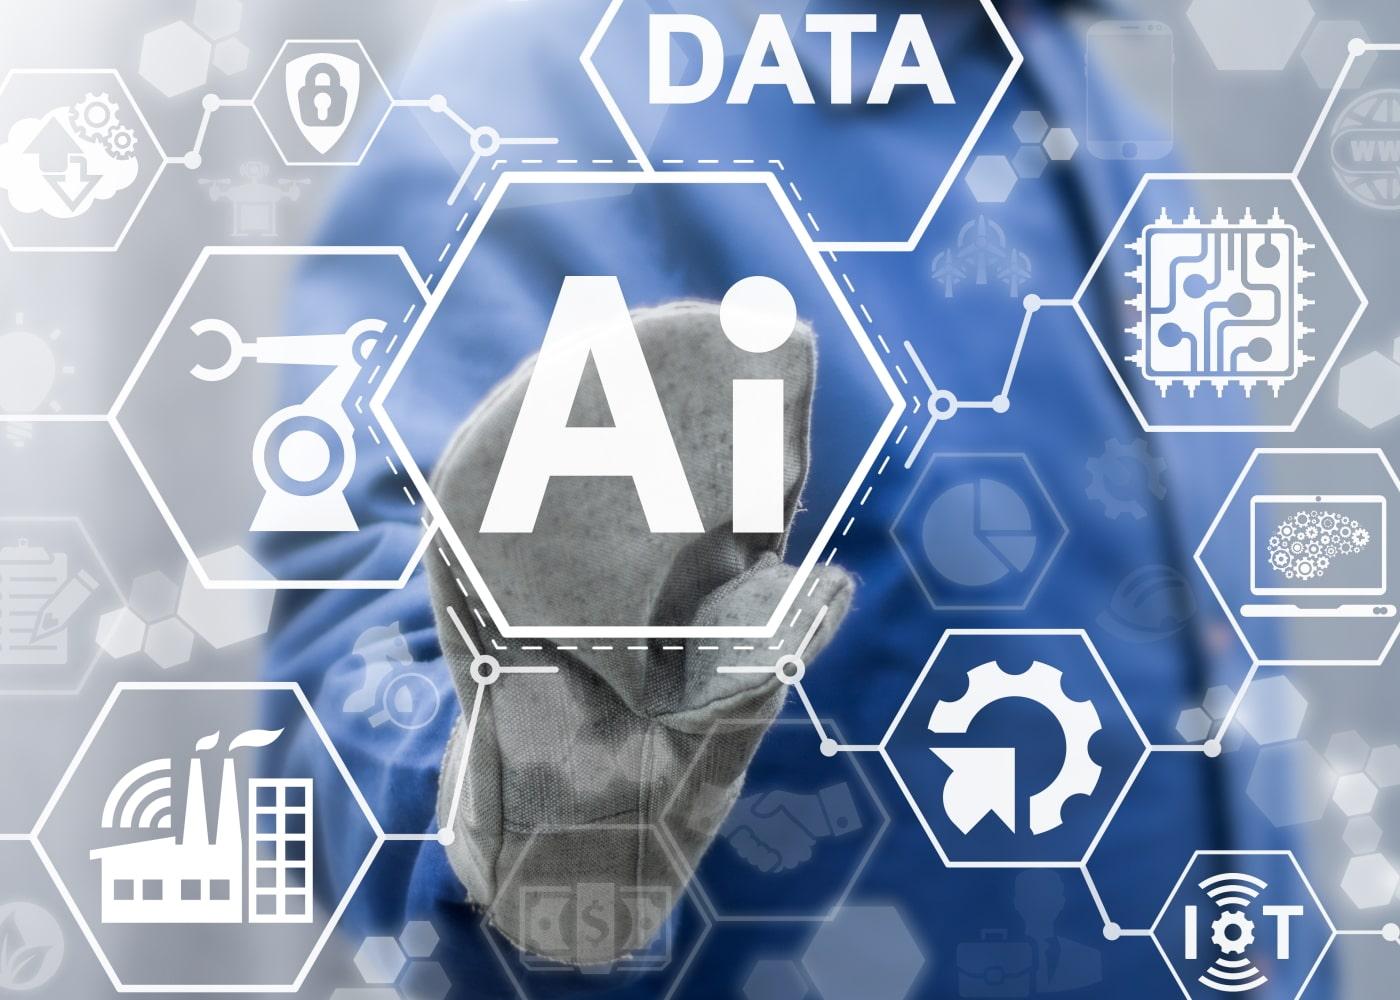 naem-2021-webinar-banner-use-of-artificial-intelligence-ai-to-facilitate-ehs-audits-ehsai-700x500